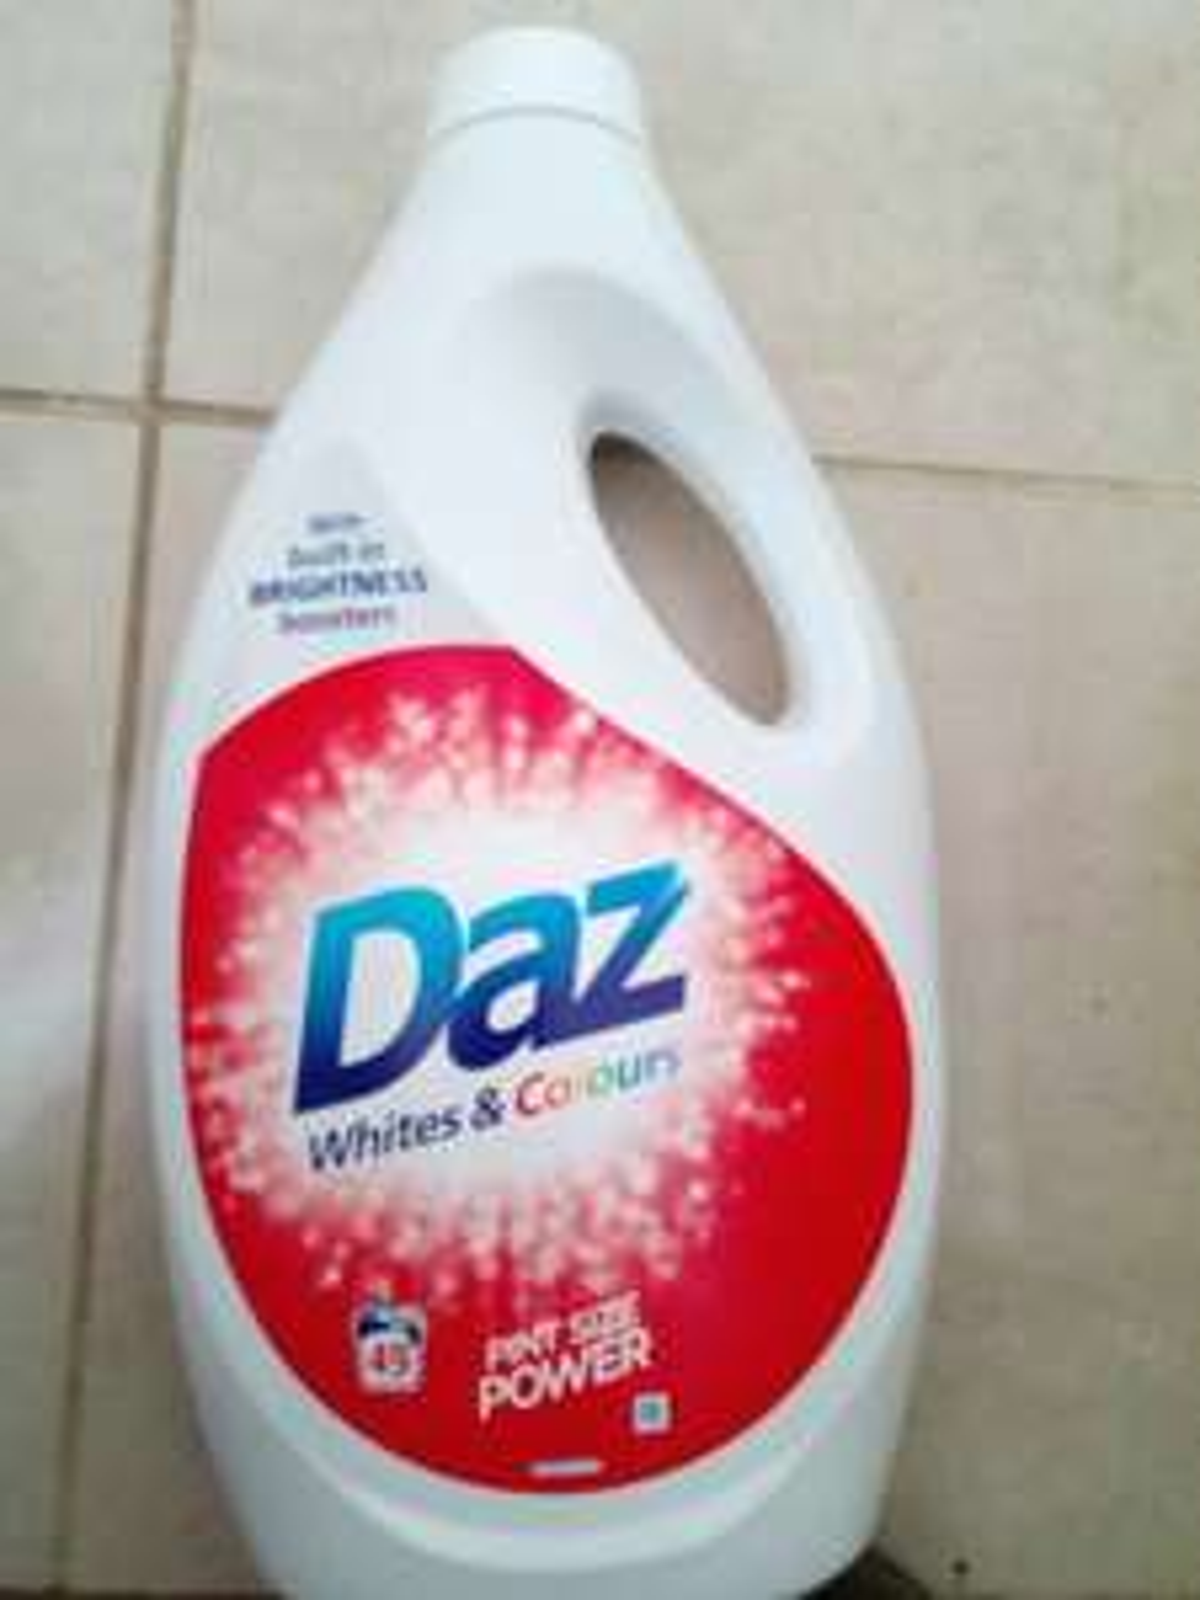 Daz washing liquid 49 washes 1.7L £2 @ Poundland seven sisters road instore